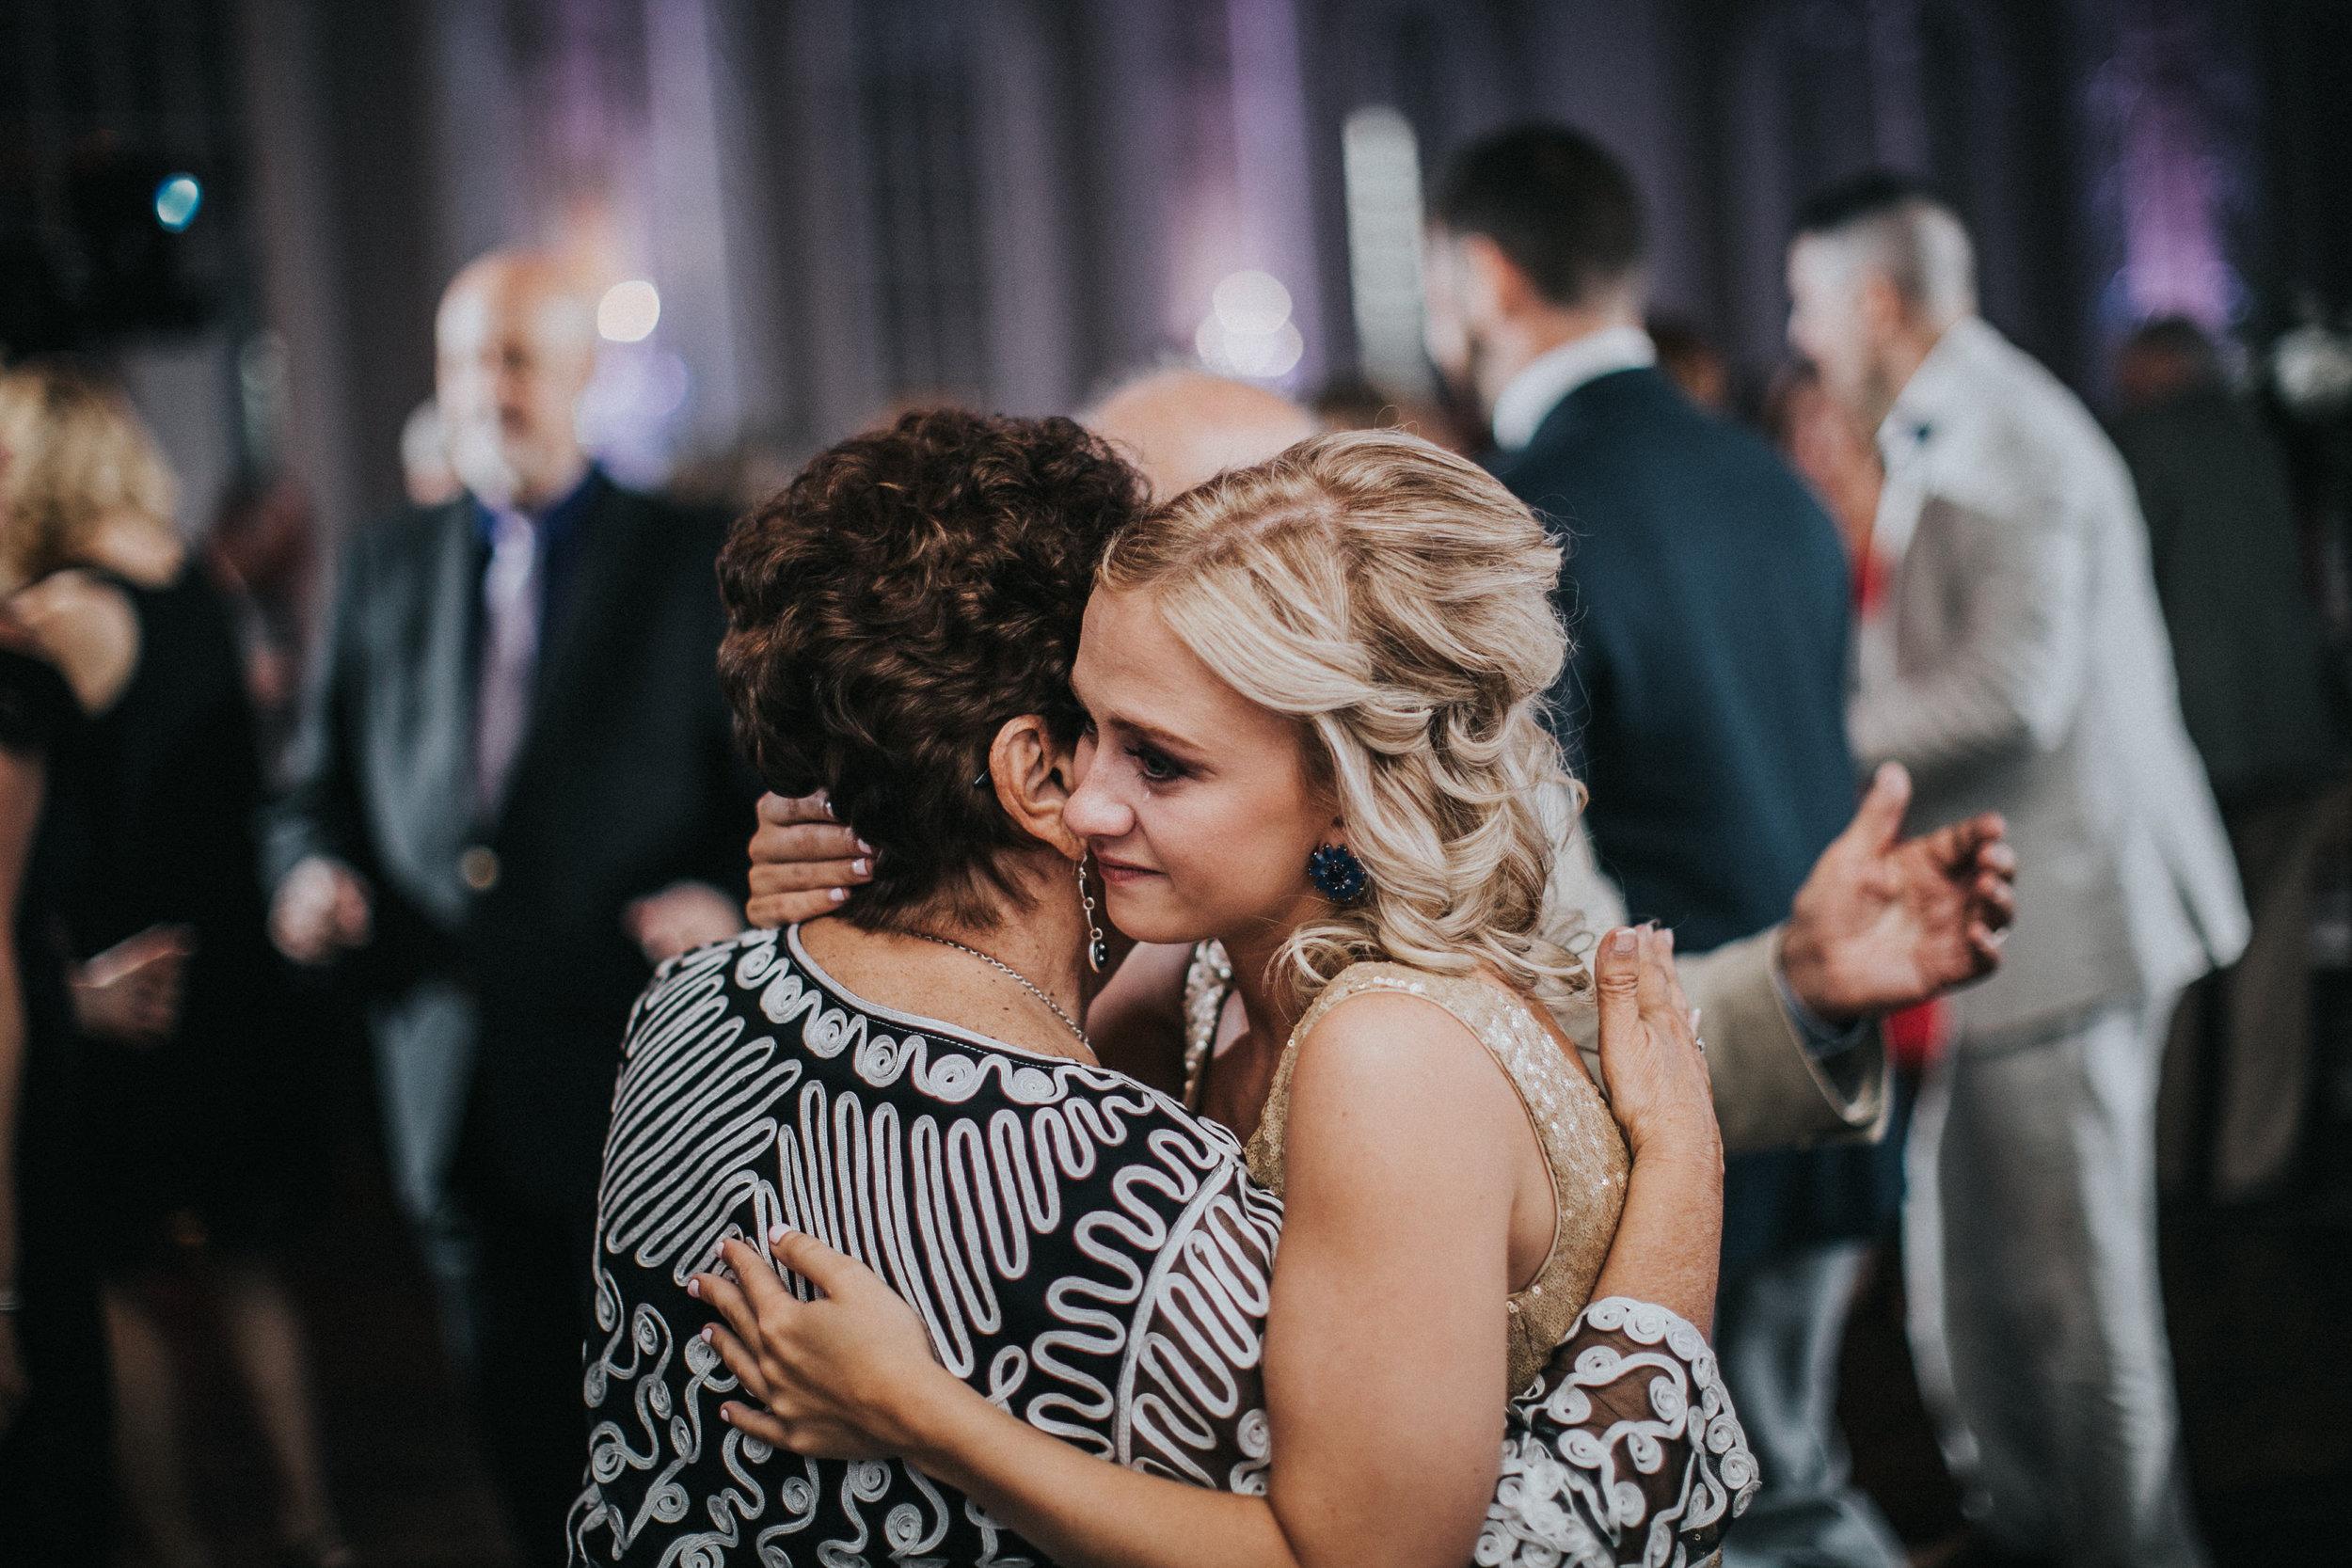 JennaLynnPhotography-NJWeddingPhotographer-Wedding-TheBerkeley-AsburyPark-Allison&Michael-Reception-105.jpg